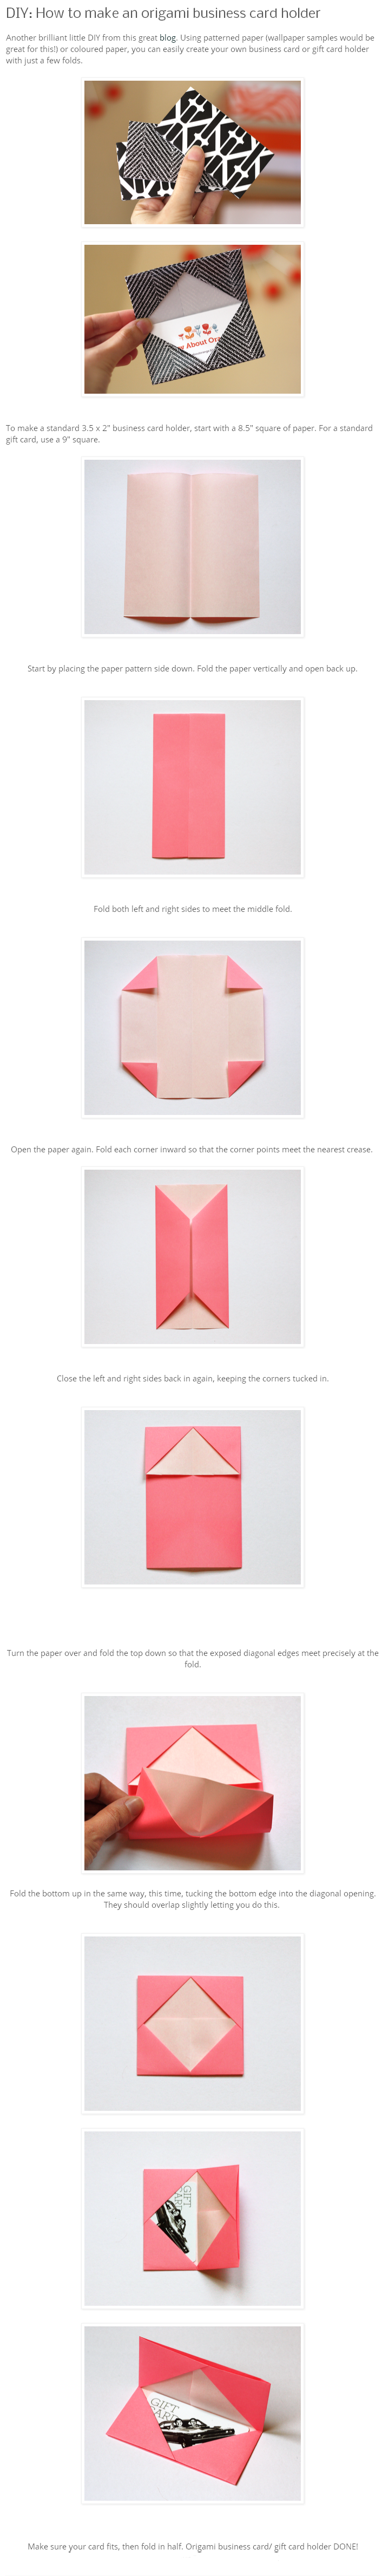 DIY origami business card holder | My Style | Pinterest | Diy ...